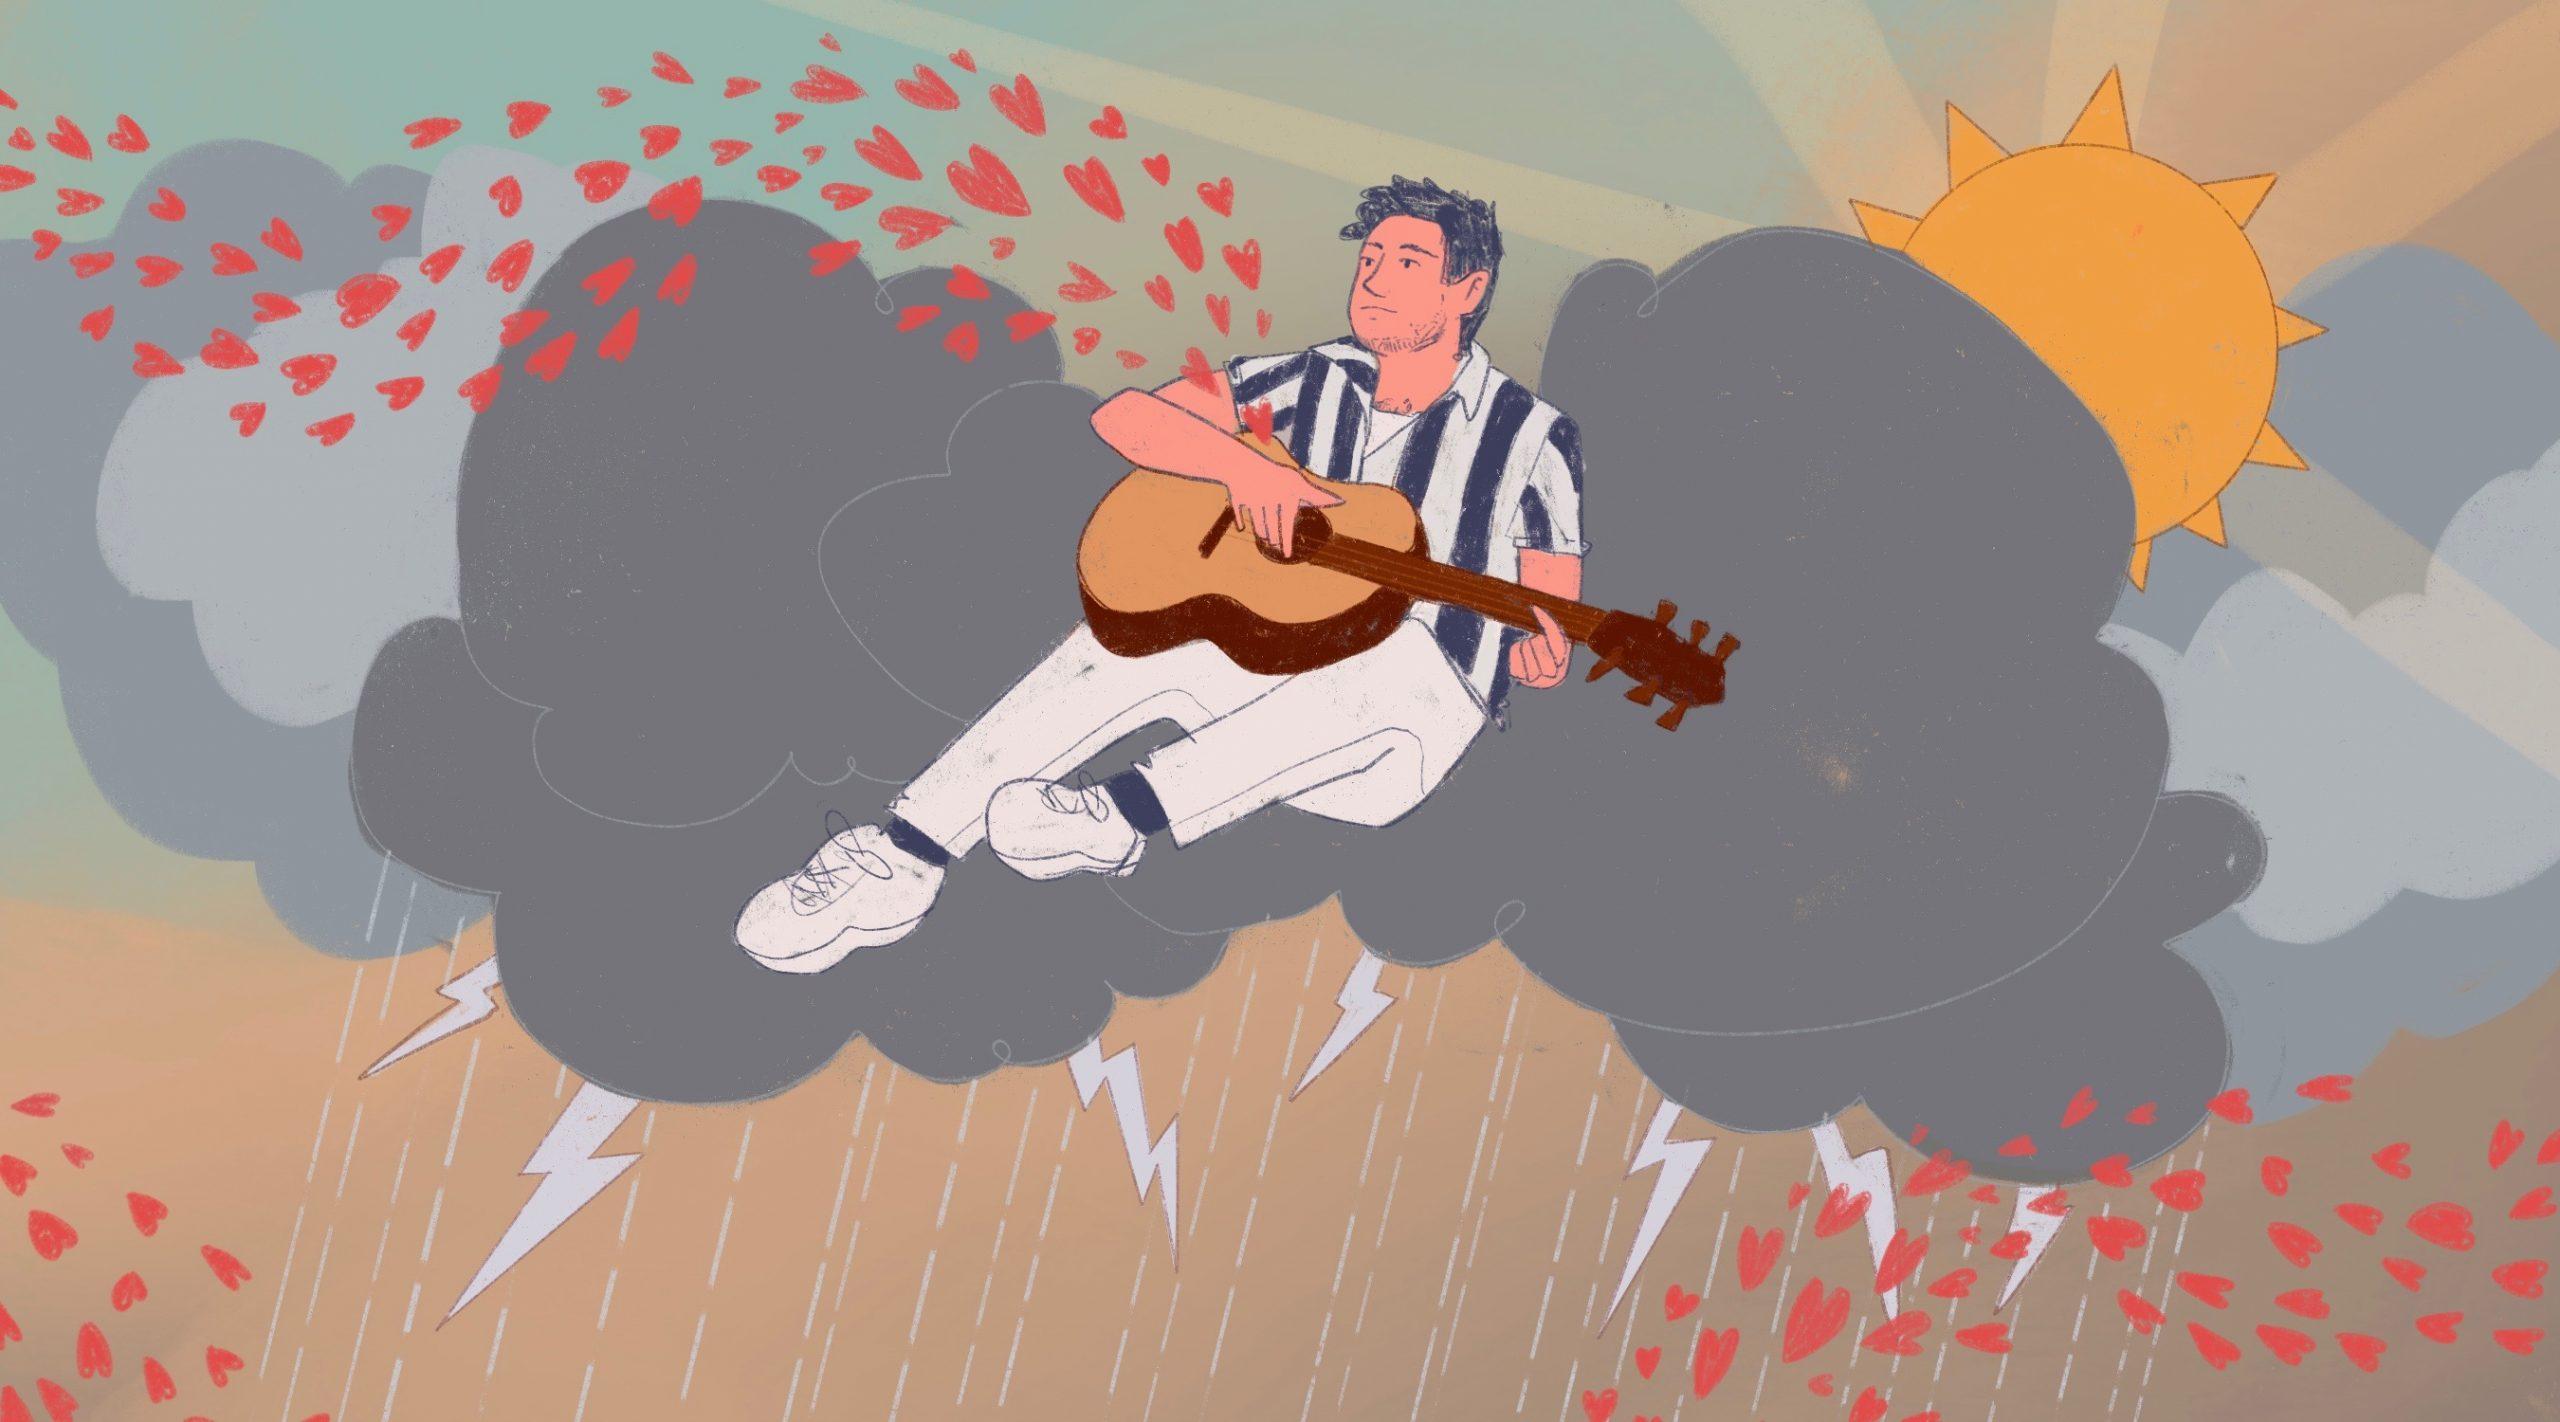 Heartbreak Weather Predicts A Regressive Storm For Niall Horan